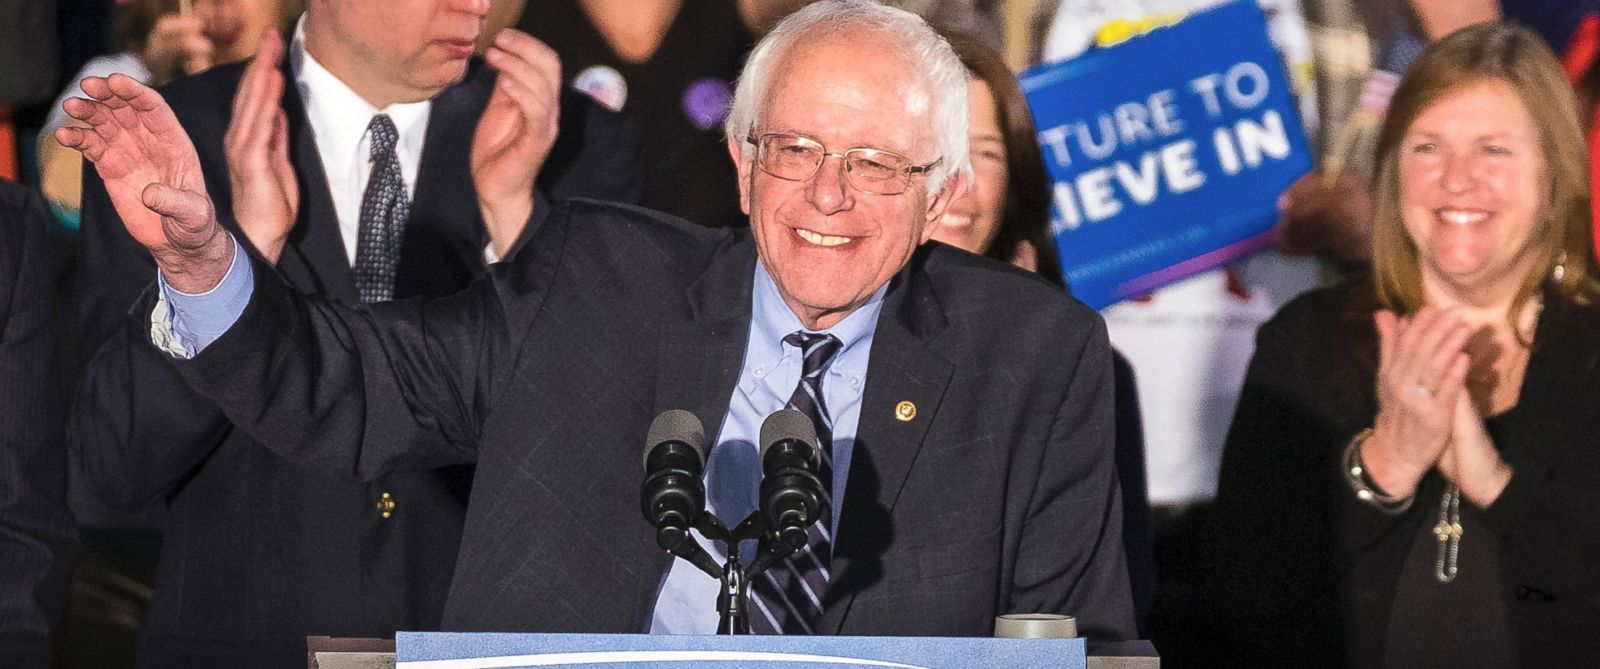 PHOTO: Democratic presidential candidate, Sen. Bernie Sanders smiles as he speaks at his primary night rally, Feb. 9, 2016, in Concord, N.H.